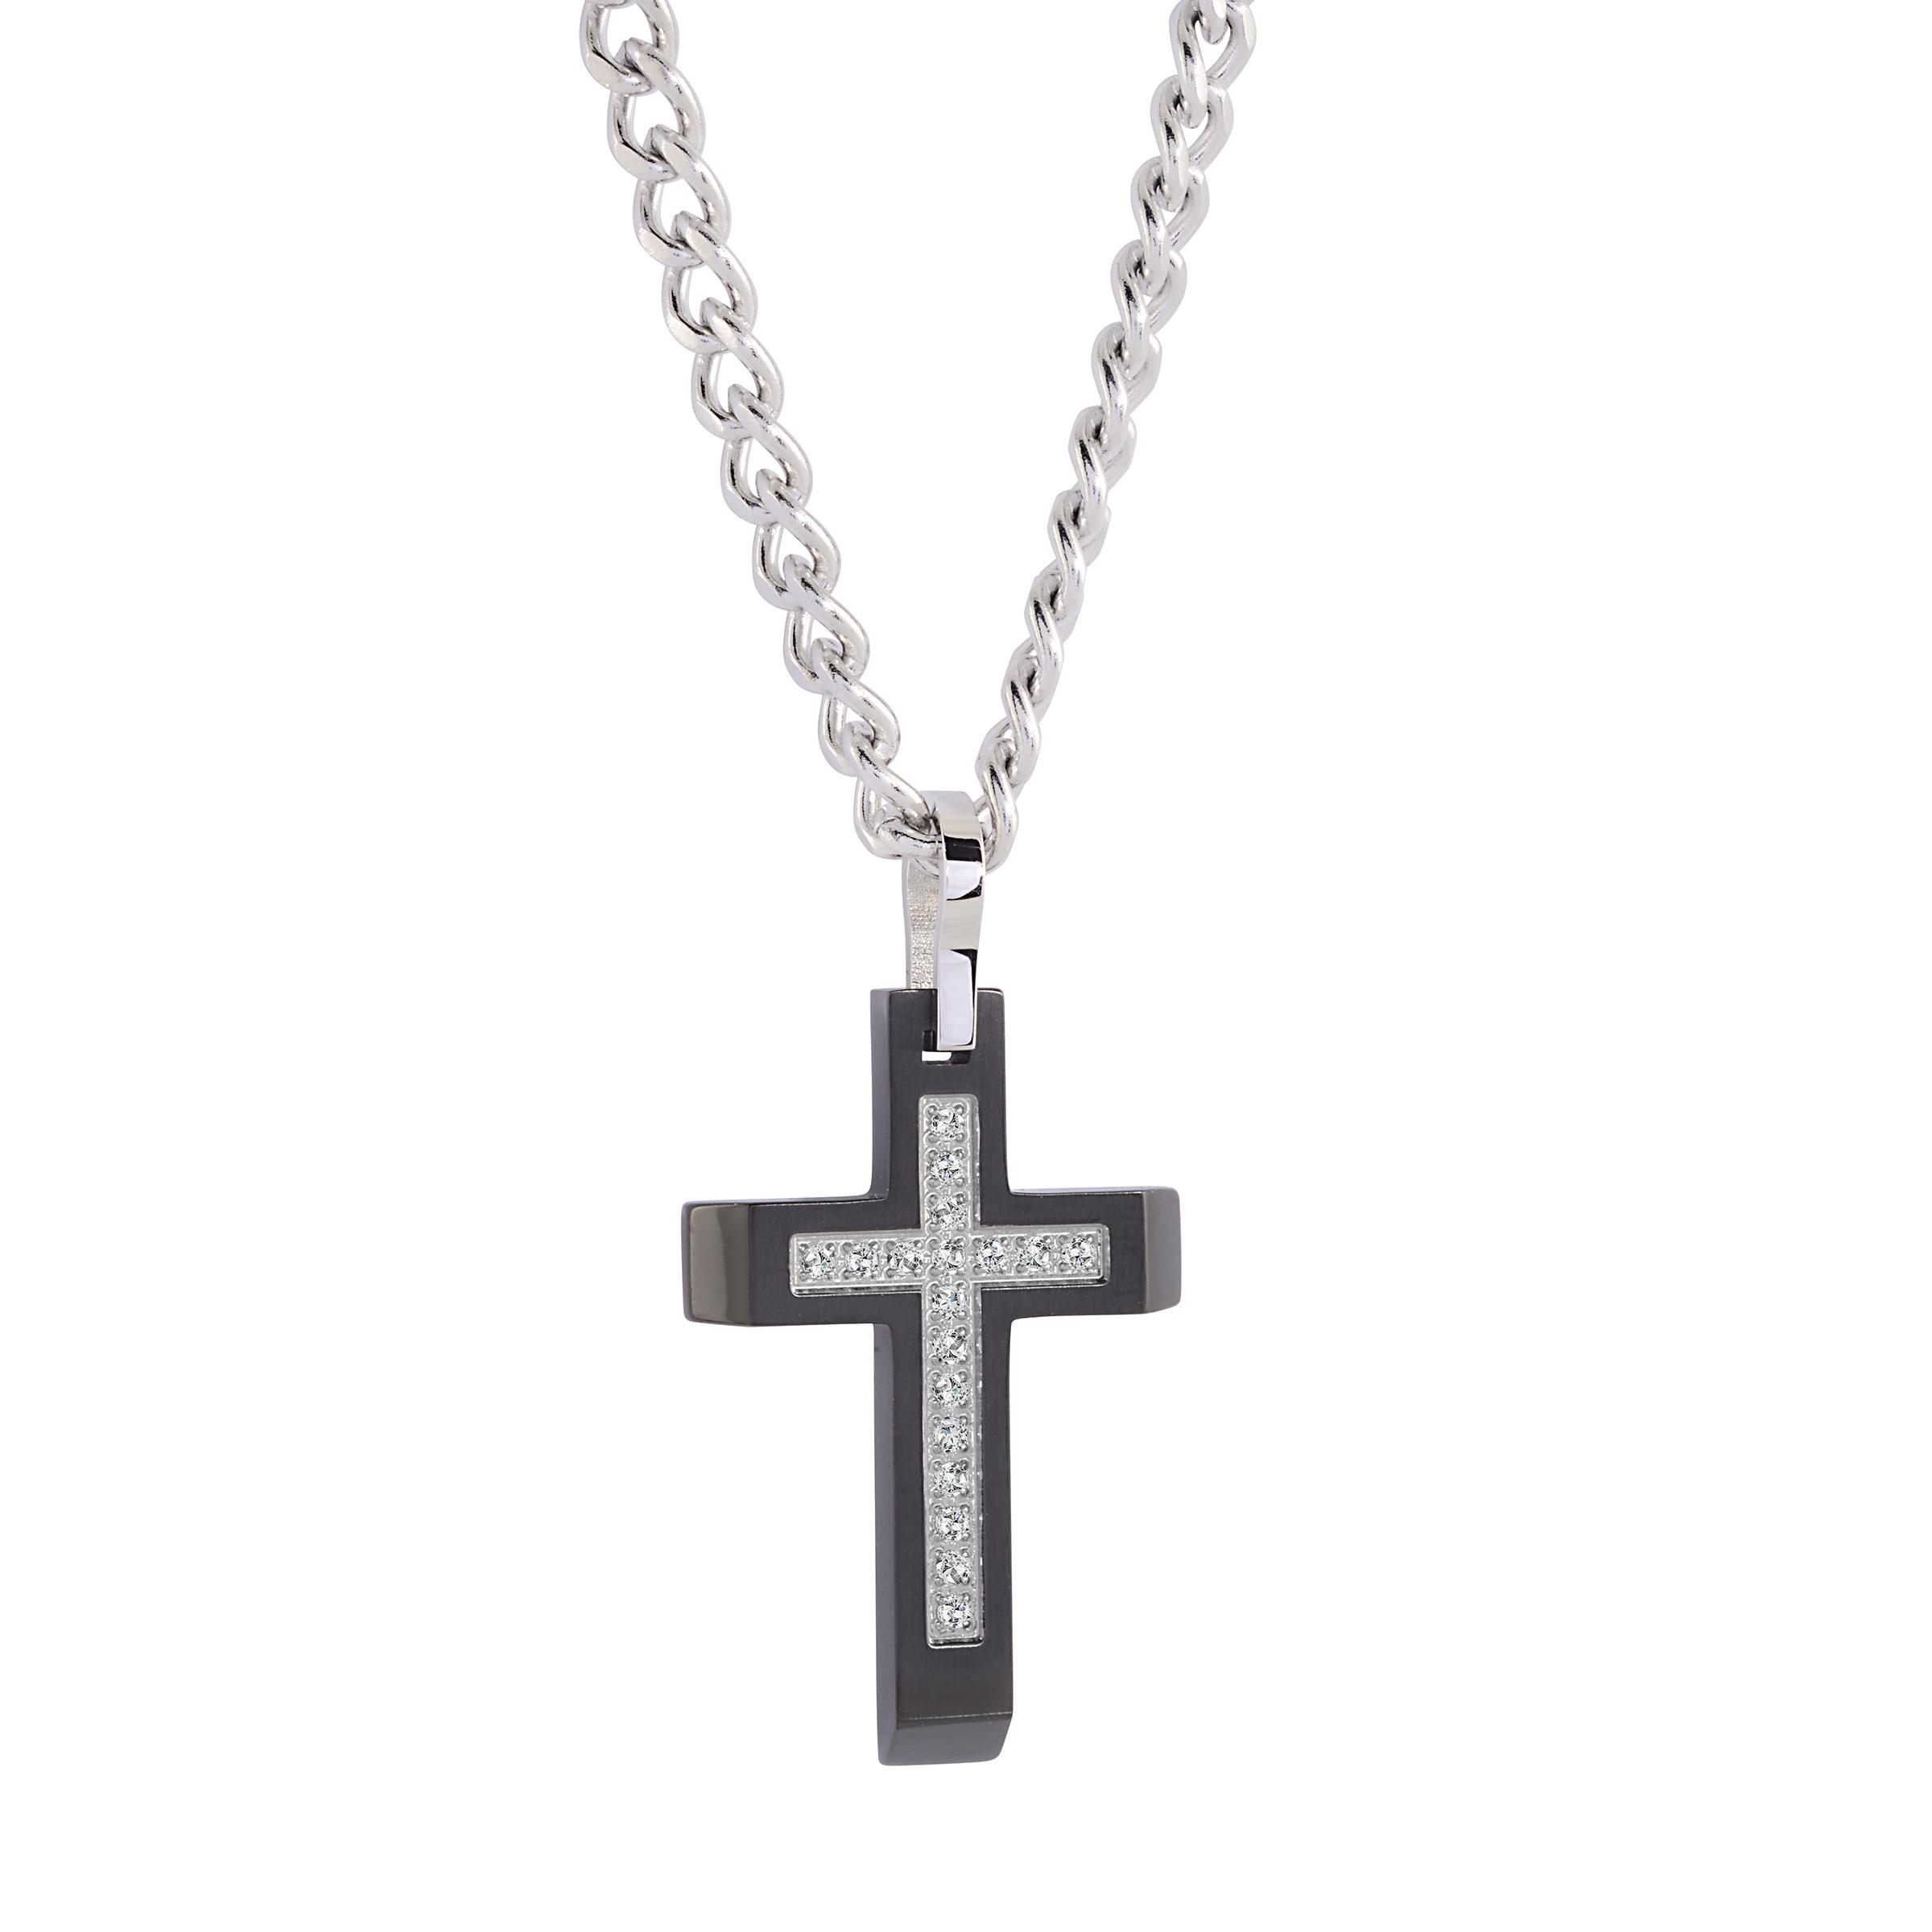 Cross pendant - Stainless steel & Cubic zirconia